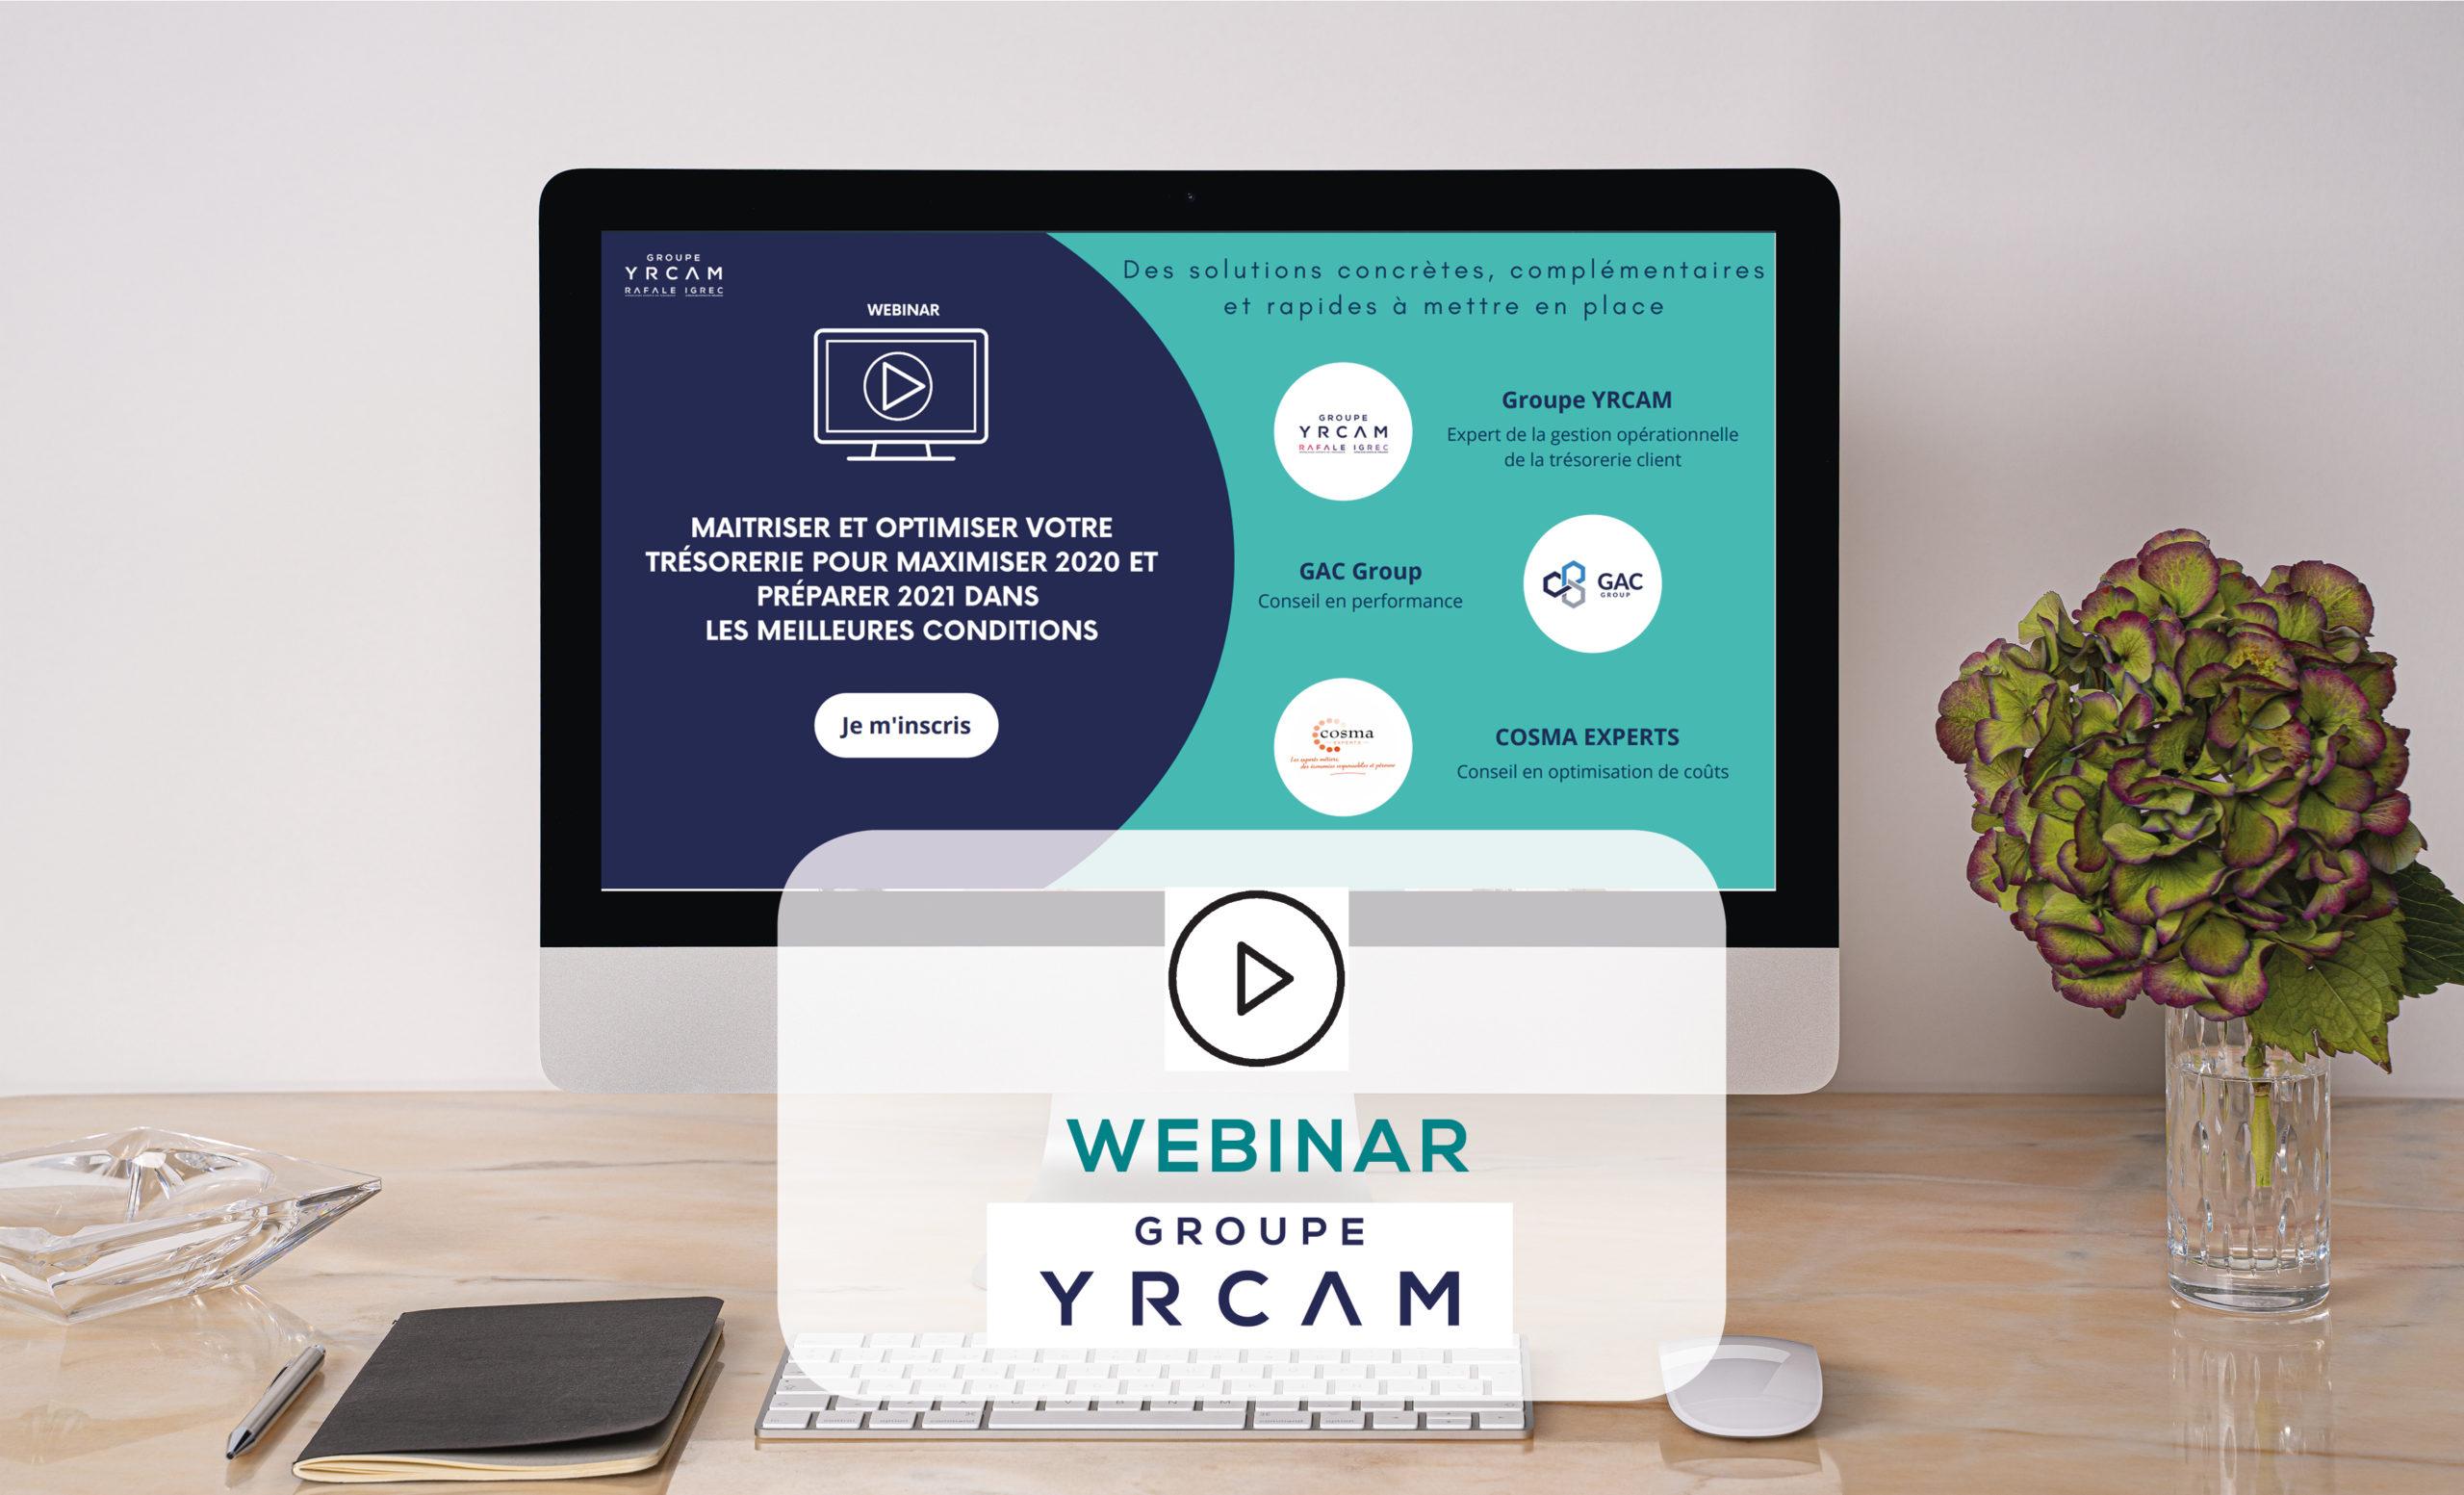 mignature Webinar Groupe Yrcam